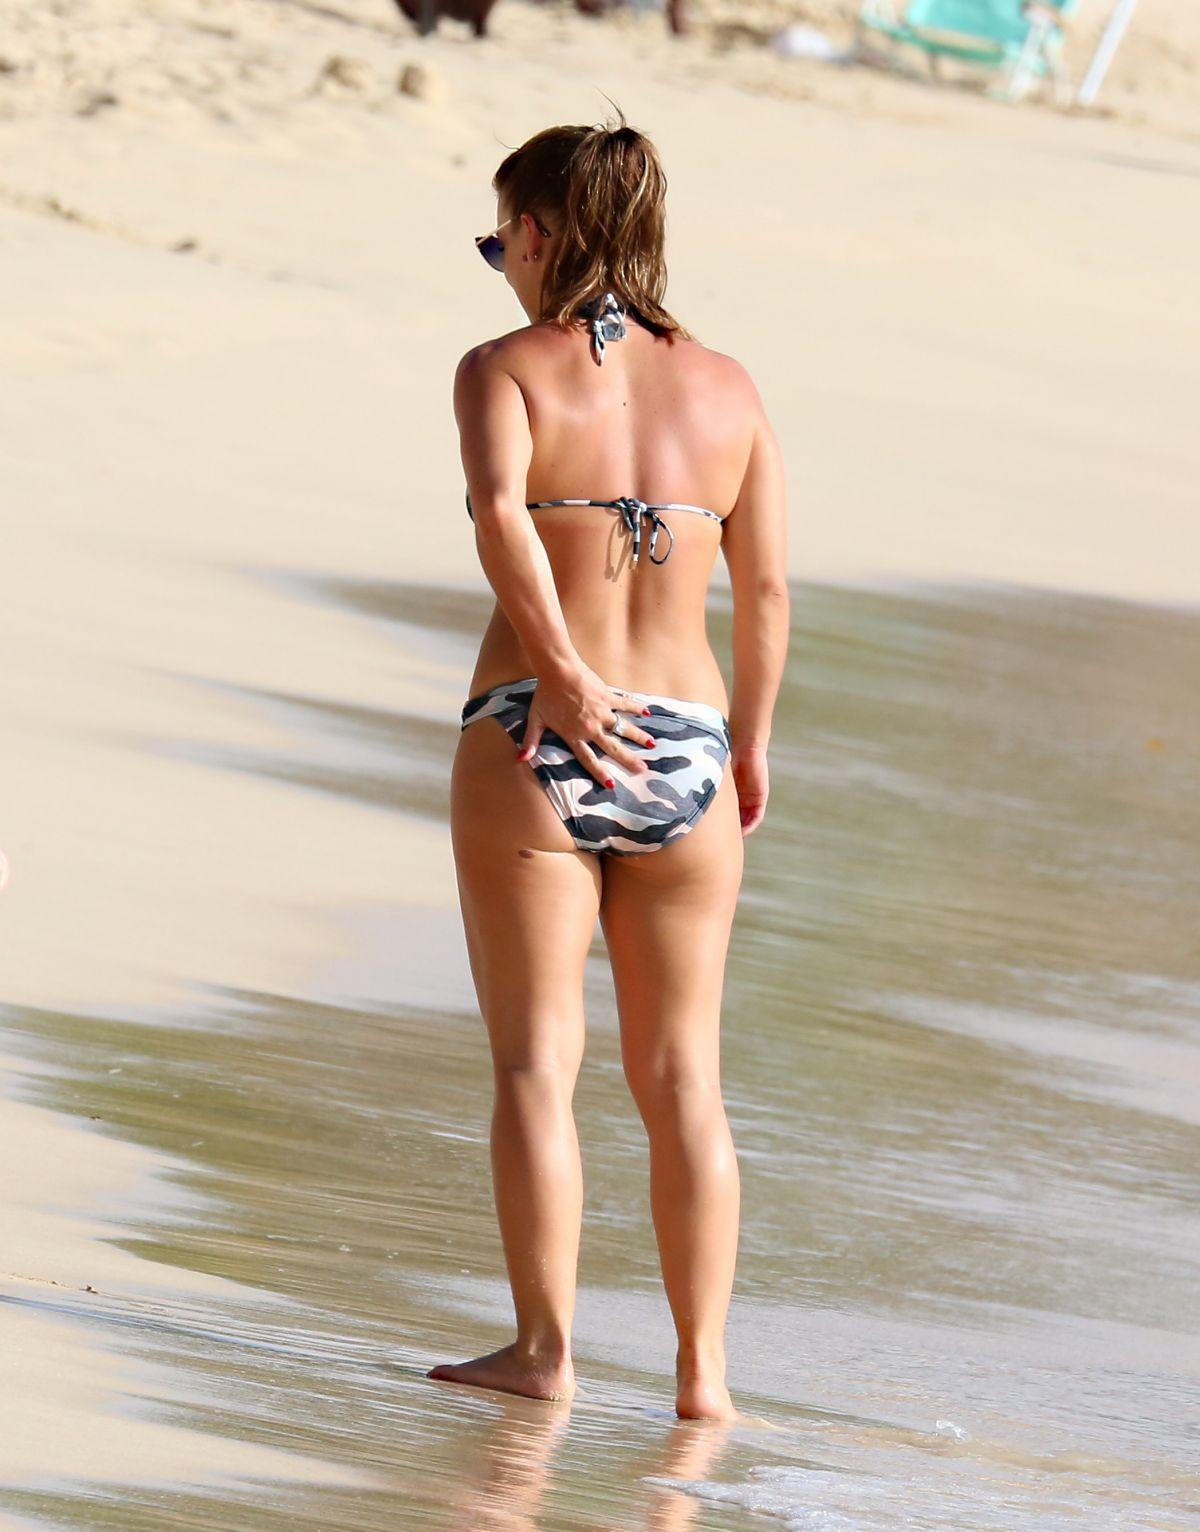 bikini Coleen mcgloughlin